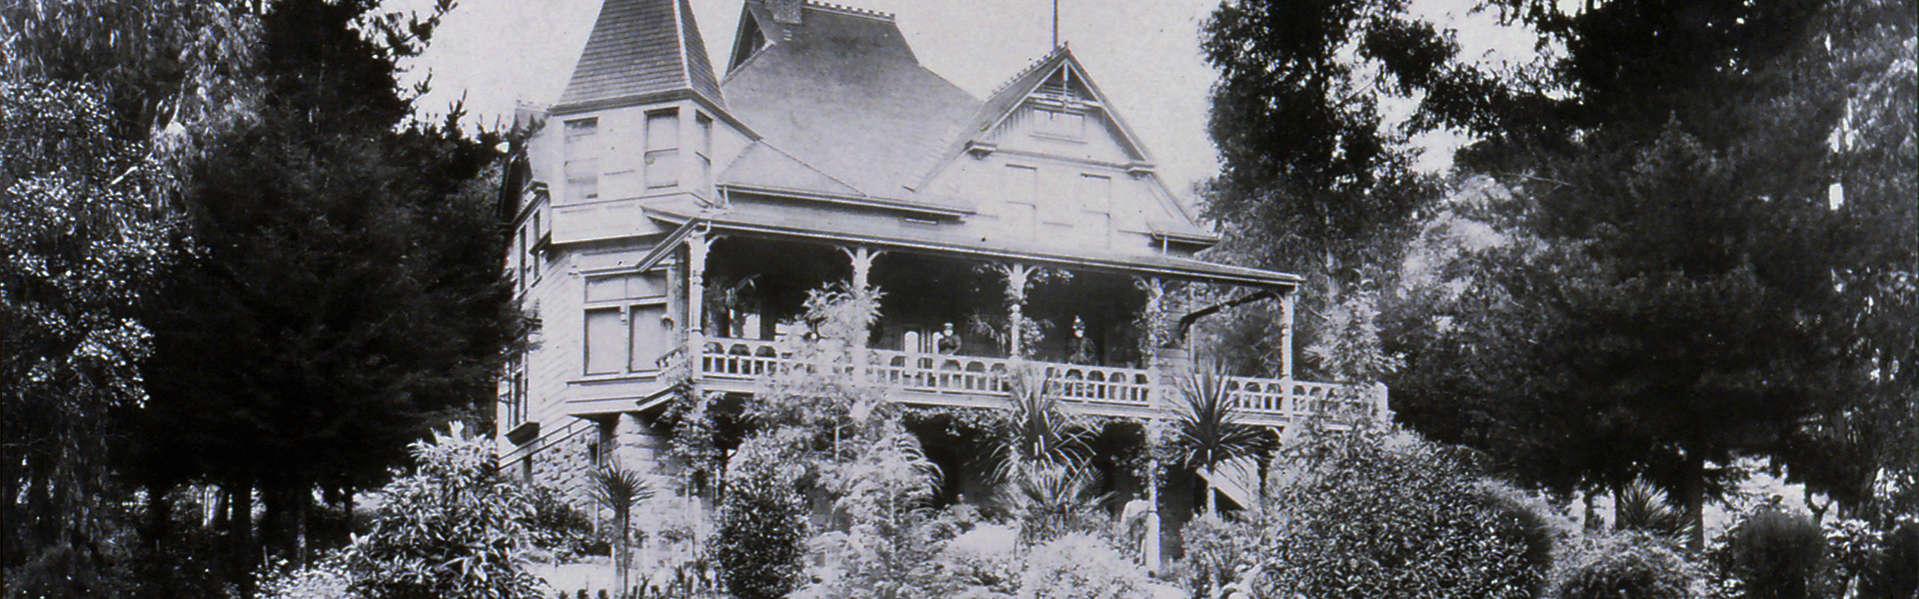 J. Schram Victorian house and formal front gardens, circa 1875